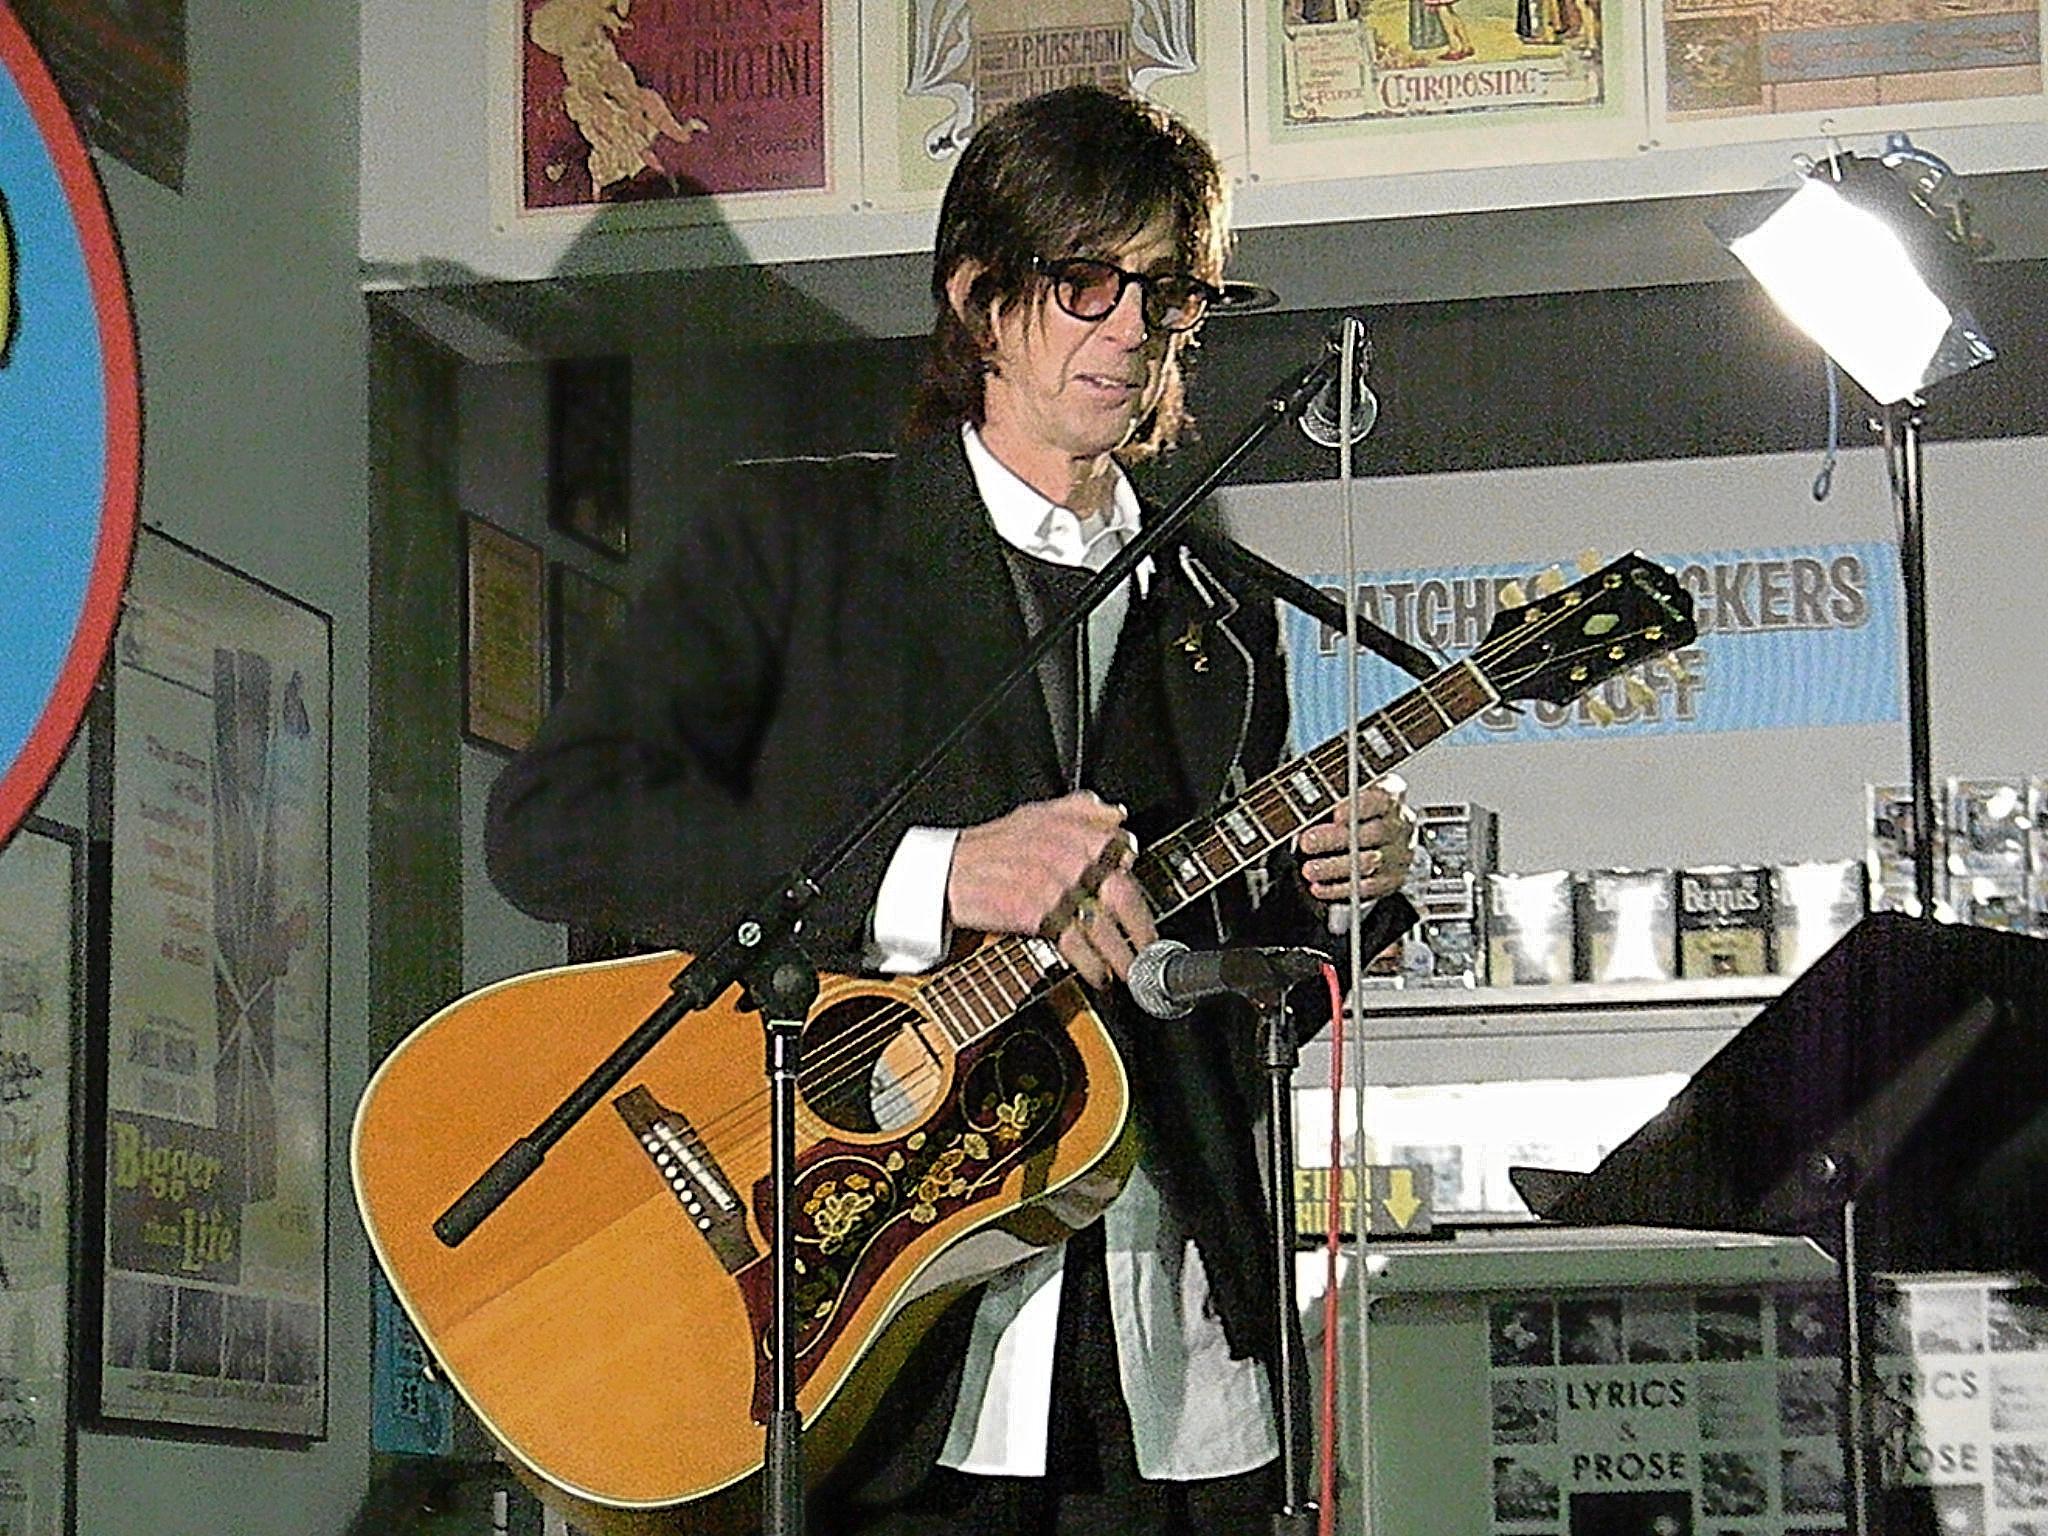 Ric Ocasek's acoustic set